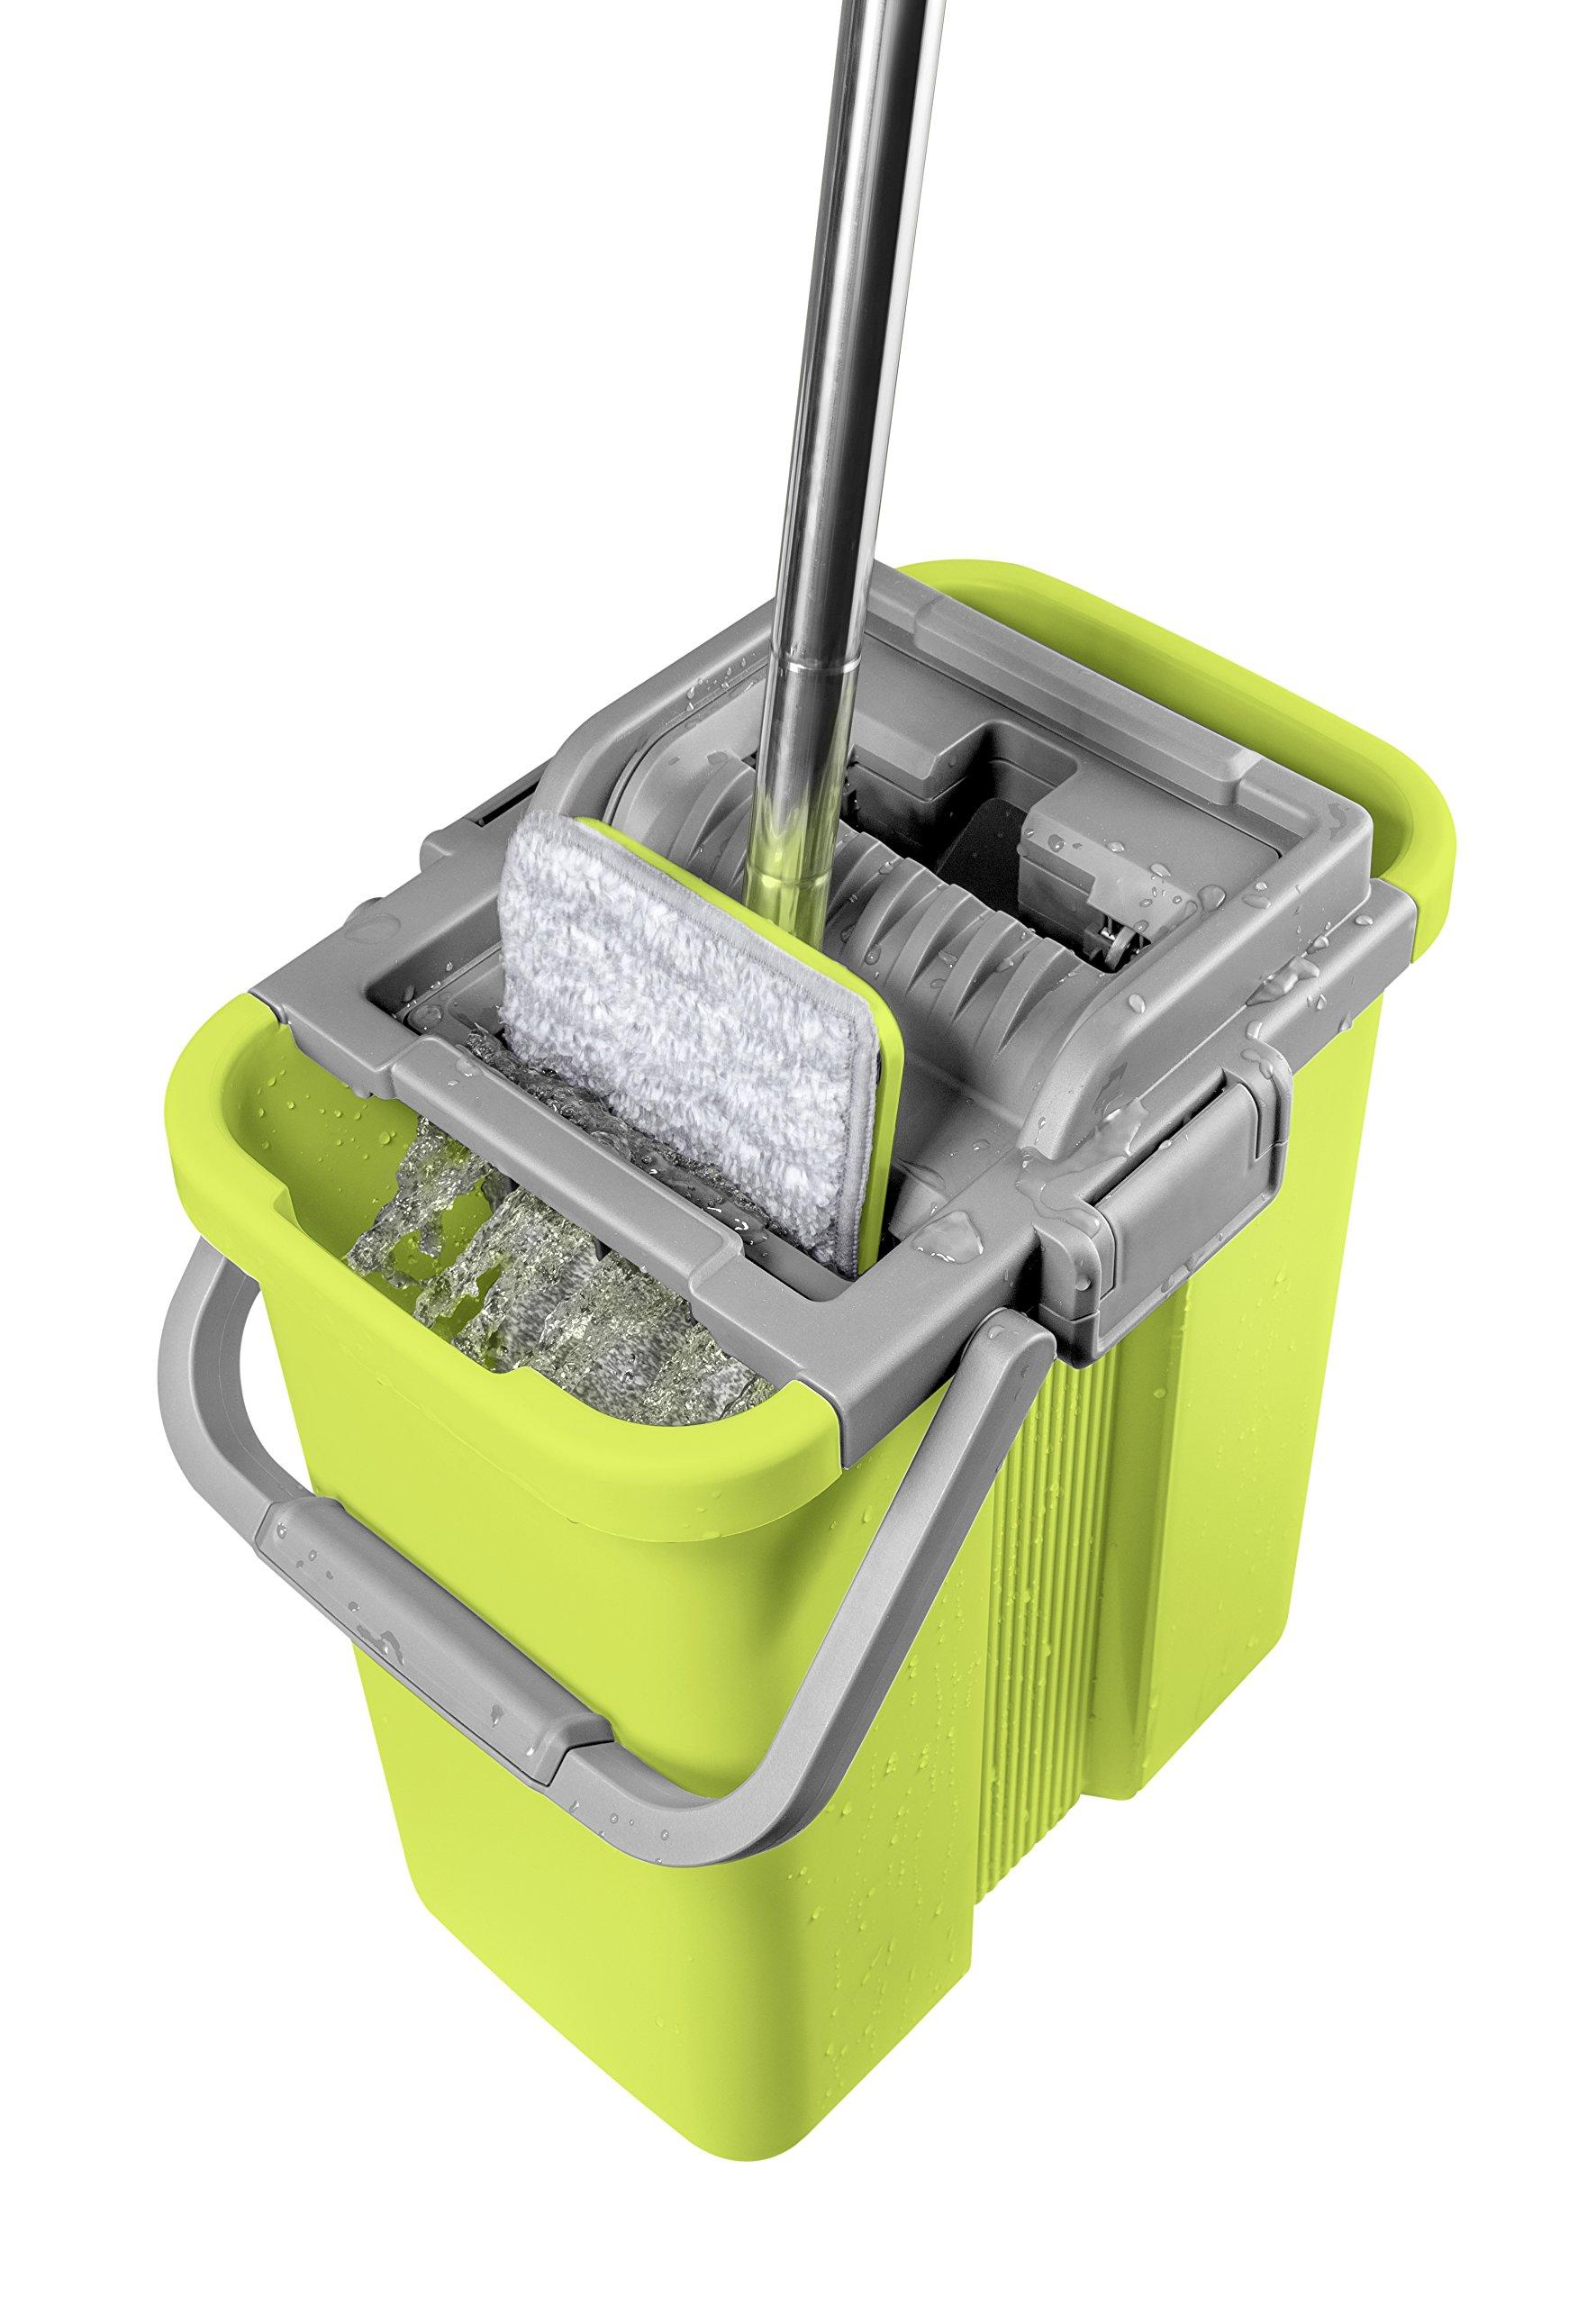 Mocio lavapavimenti Smart Mop Plus | Mocio per pulizia casa con